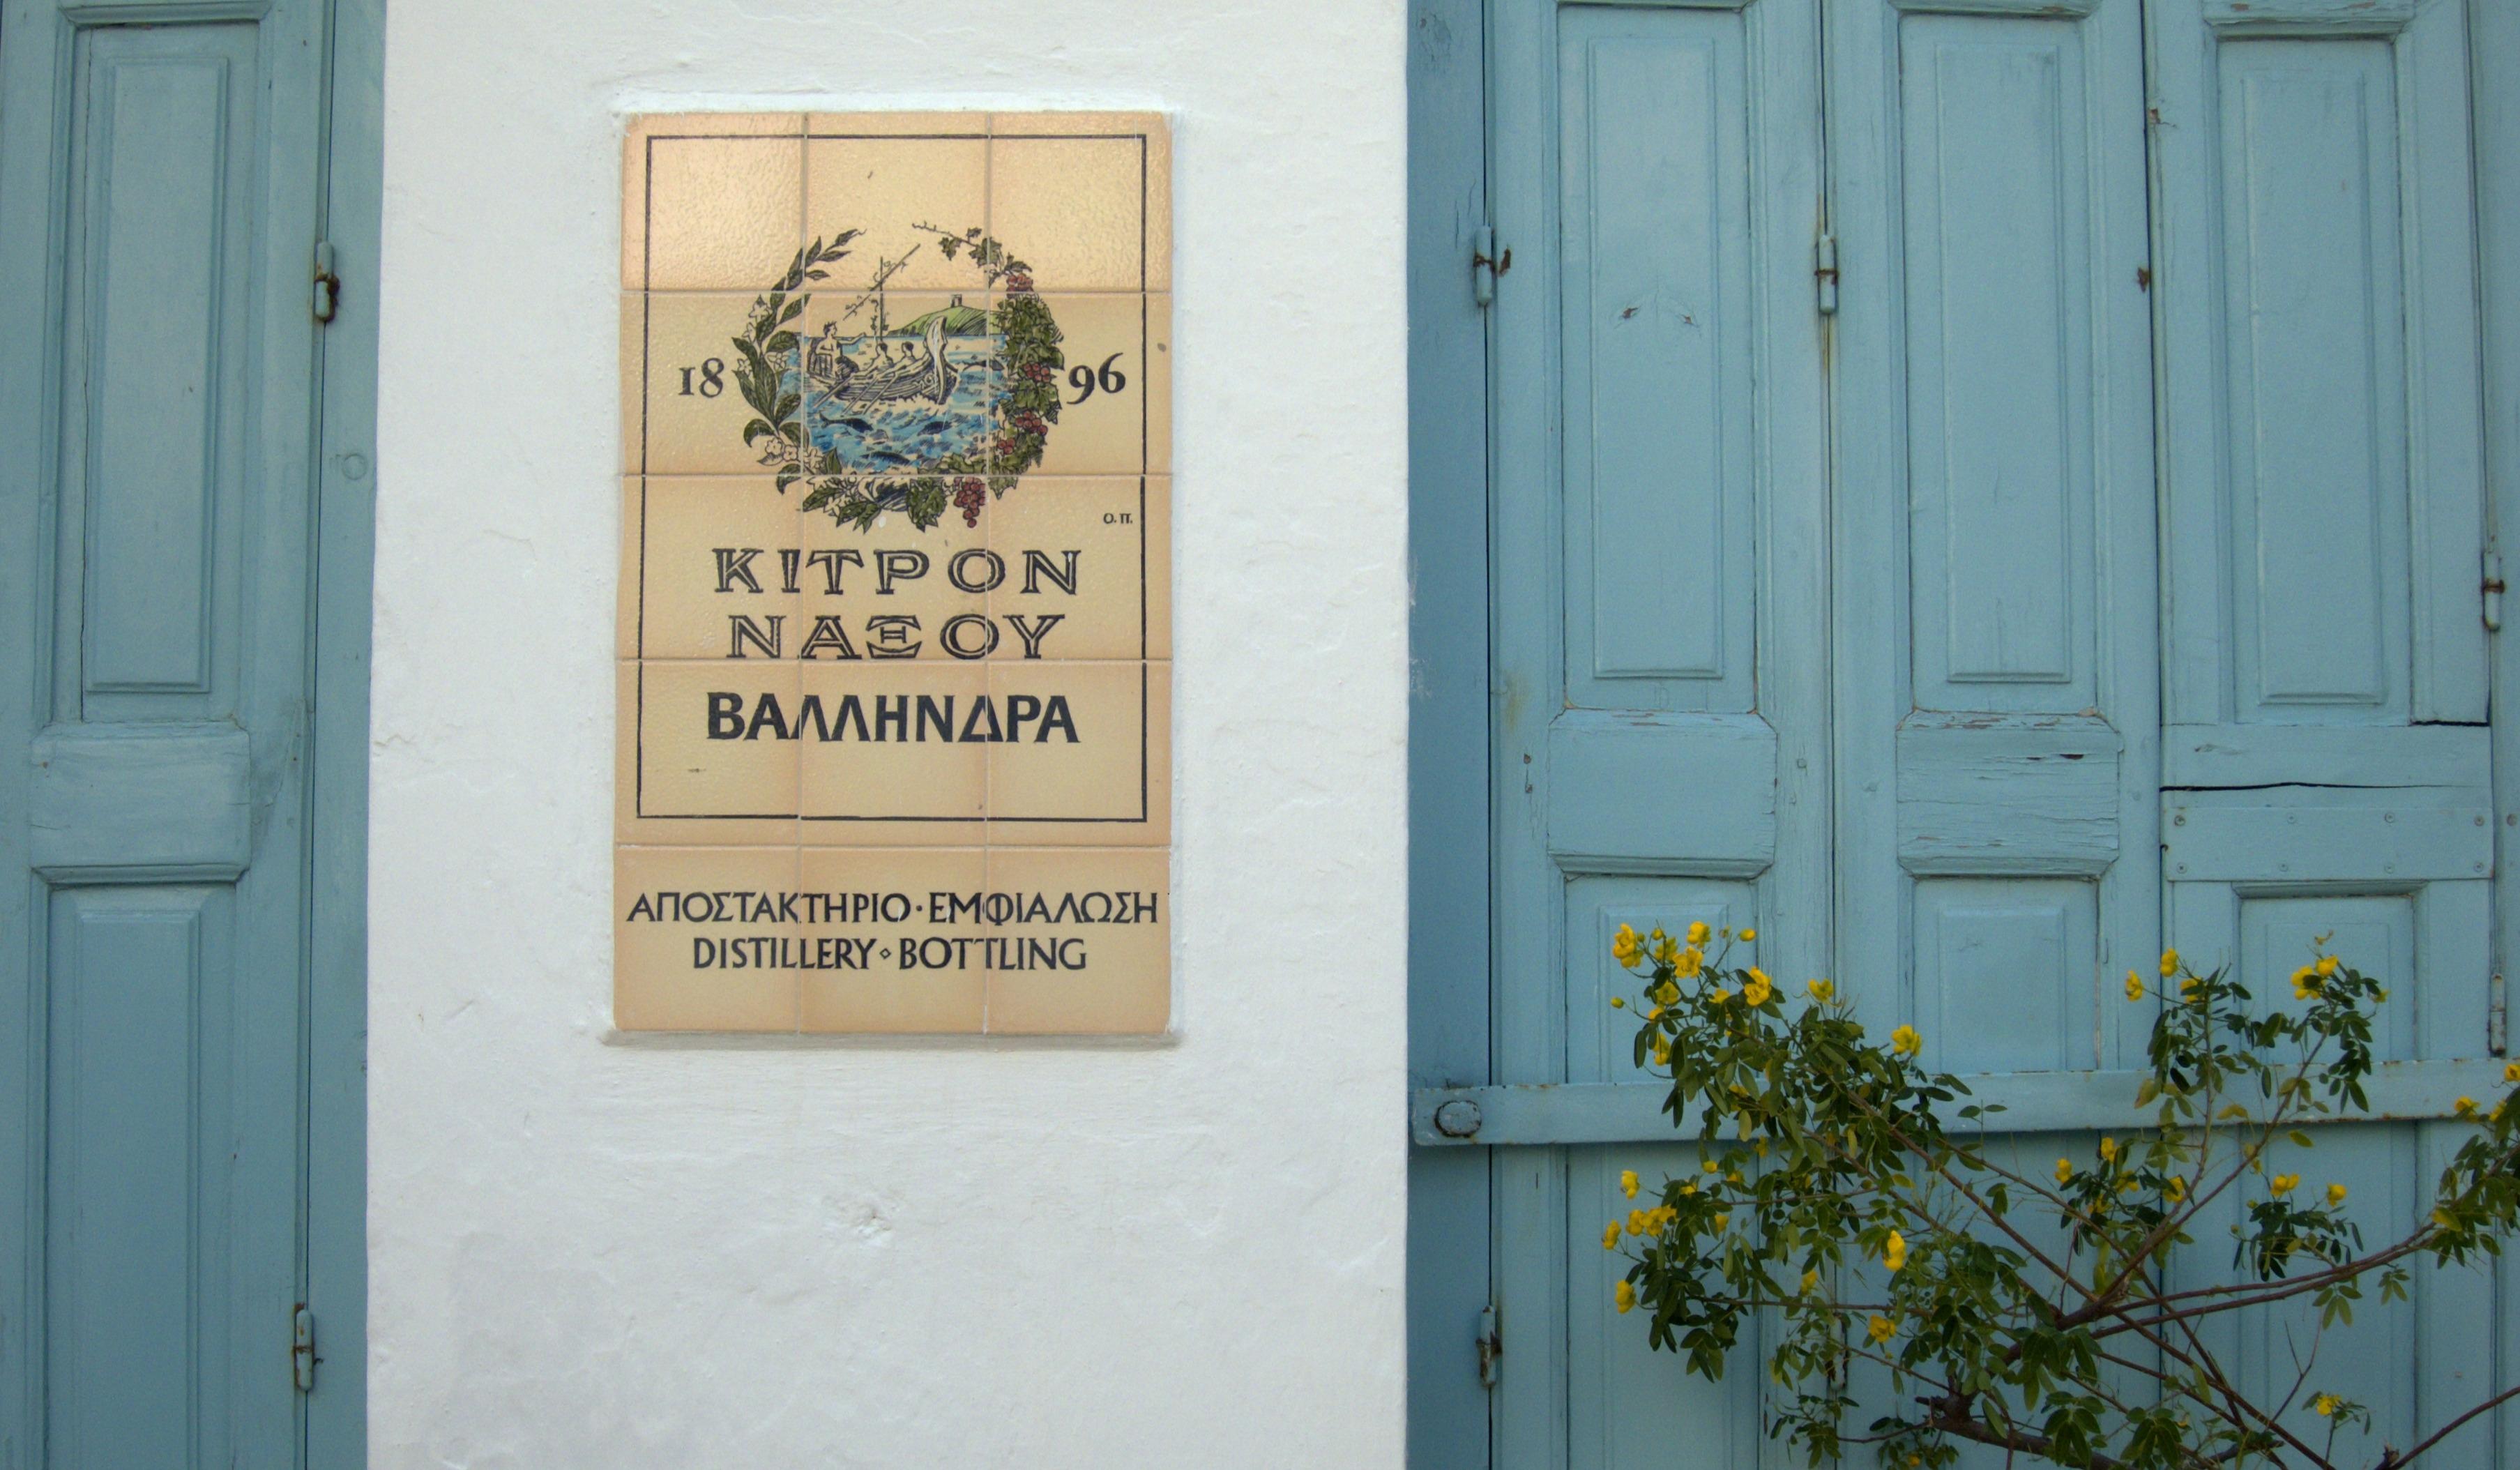 Kitron_Naxou_distillery_in_Chalki,_Entrance,_11H2483